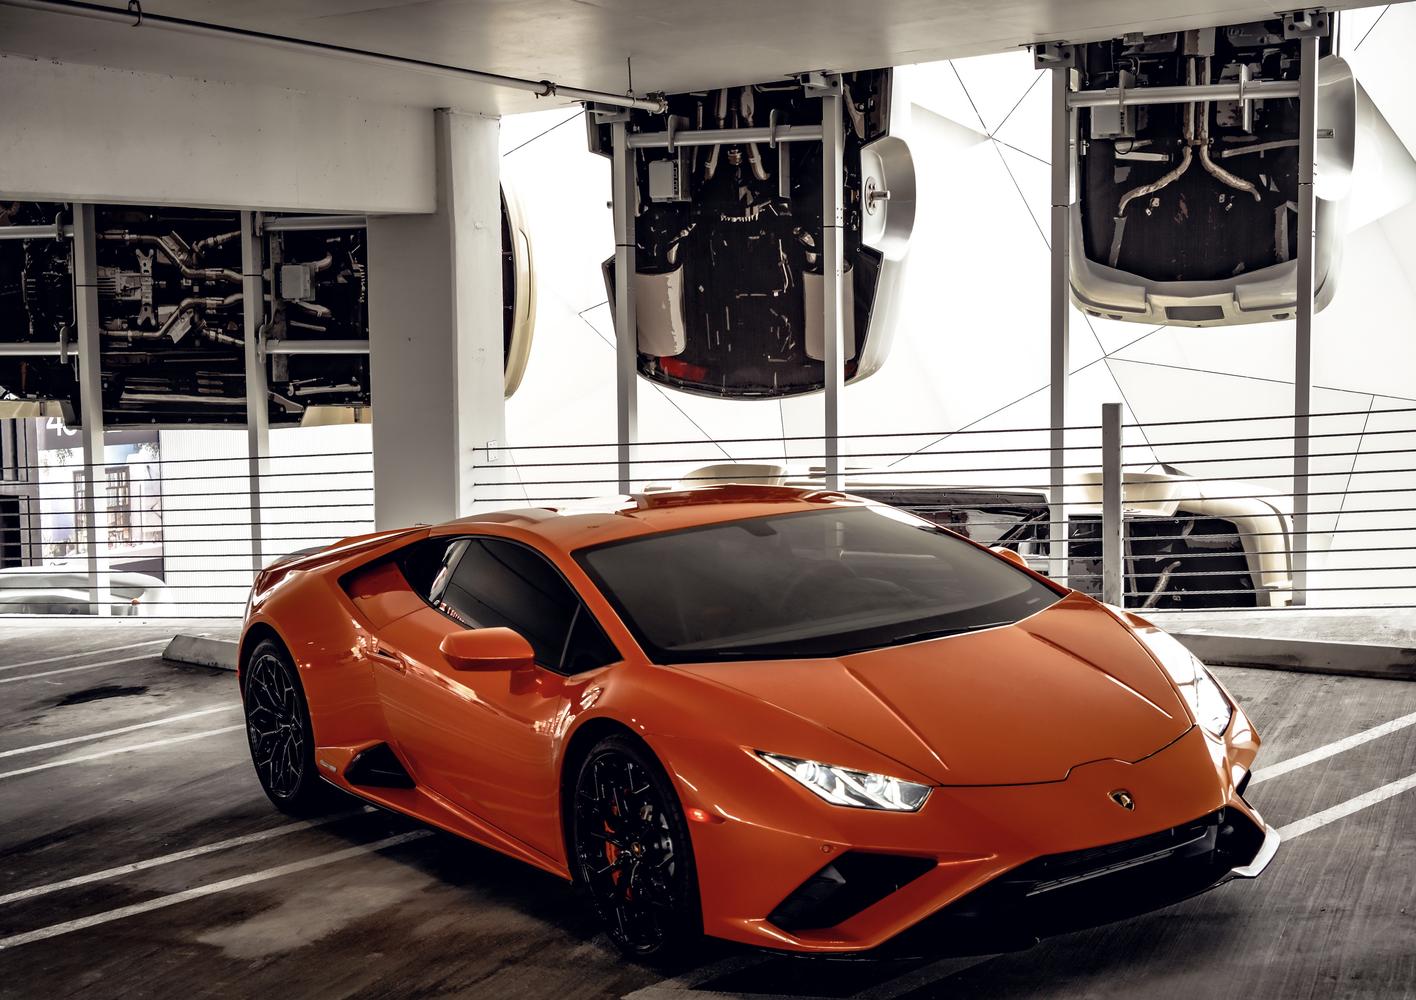 Image #5 of our  Lamborghini Huracan EVO Orange Coupe    In Miami Fort Lauderdale Palm Beach South Florida